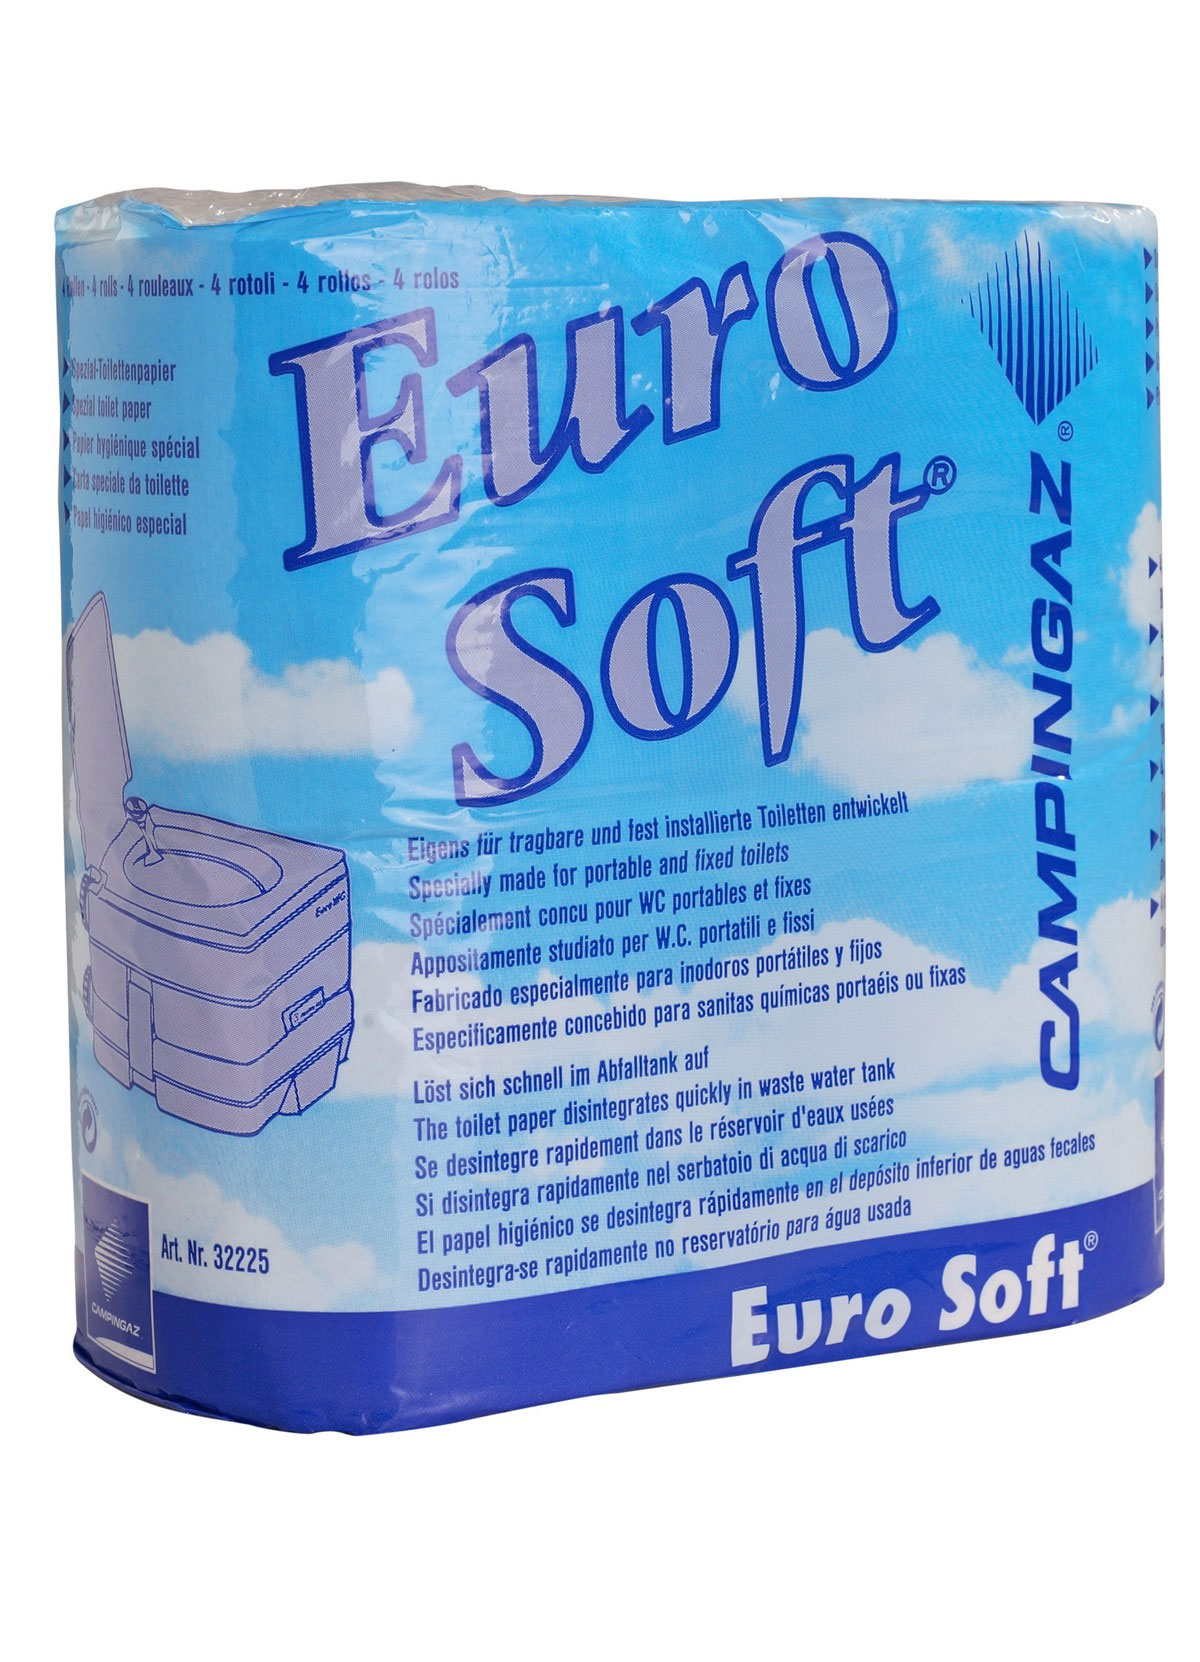 Campingaz Toilettenpapier Spezial Eurosoft Camping / Chemietoilette Bild 1